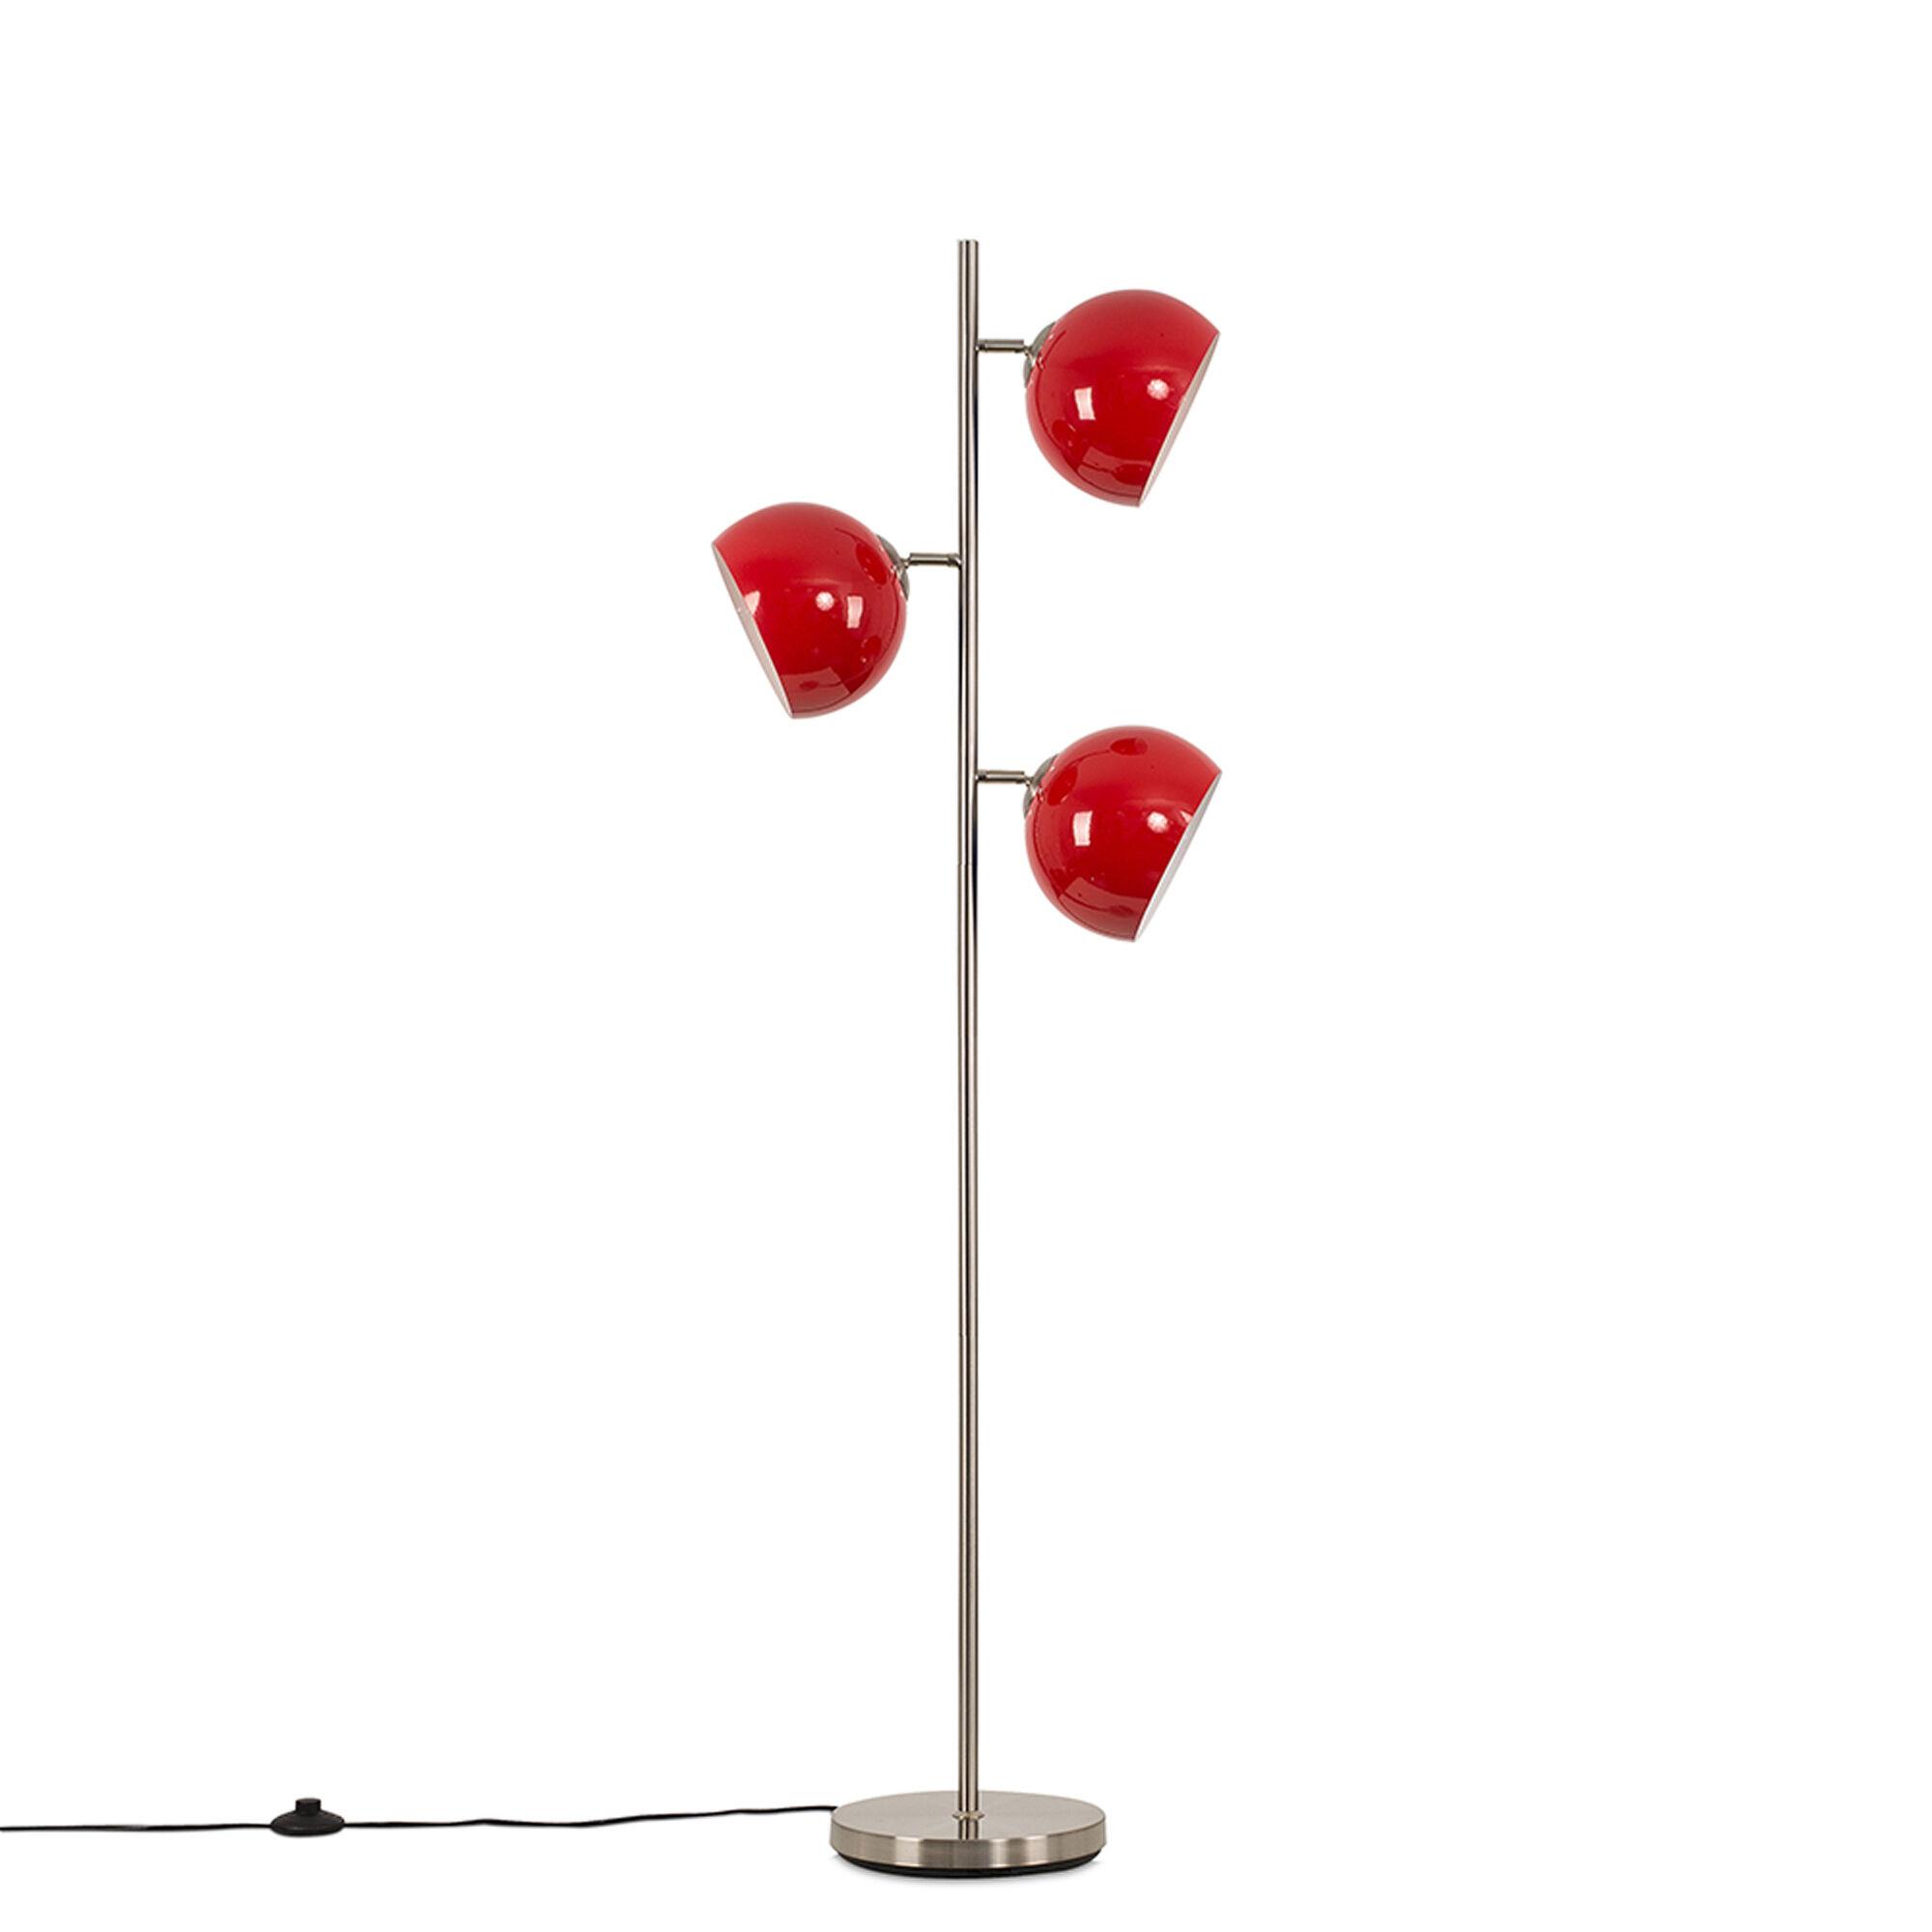 Value Lights Elliot Satin Nickel 3 Way Floor Lamp with Red Shades